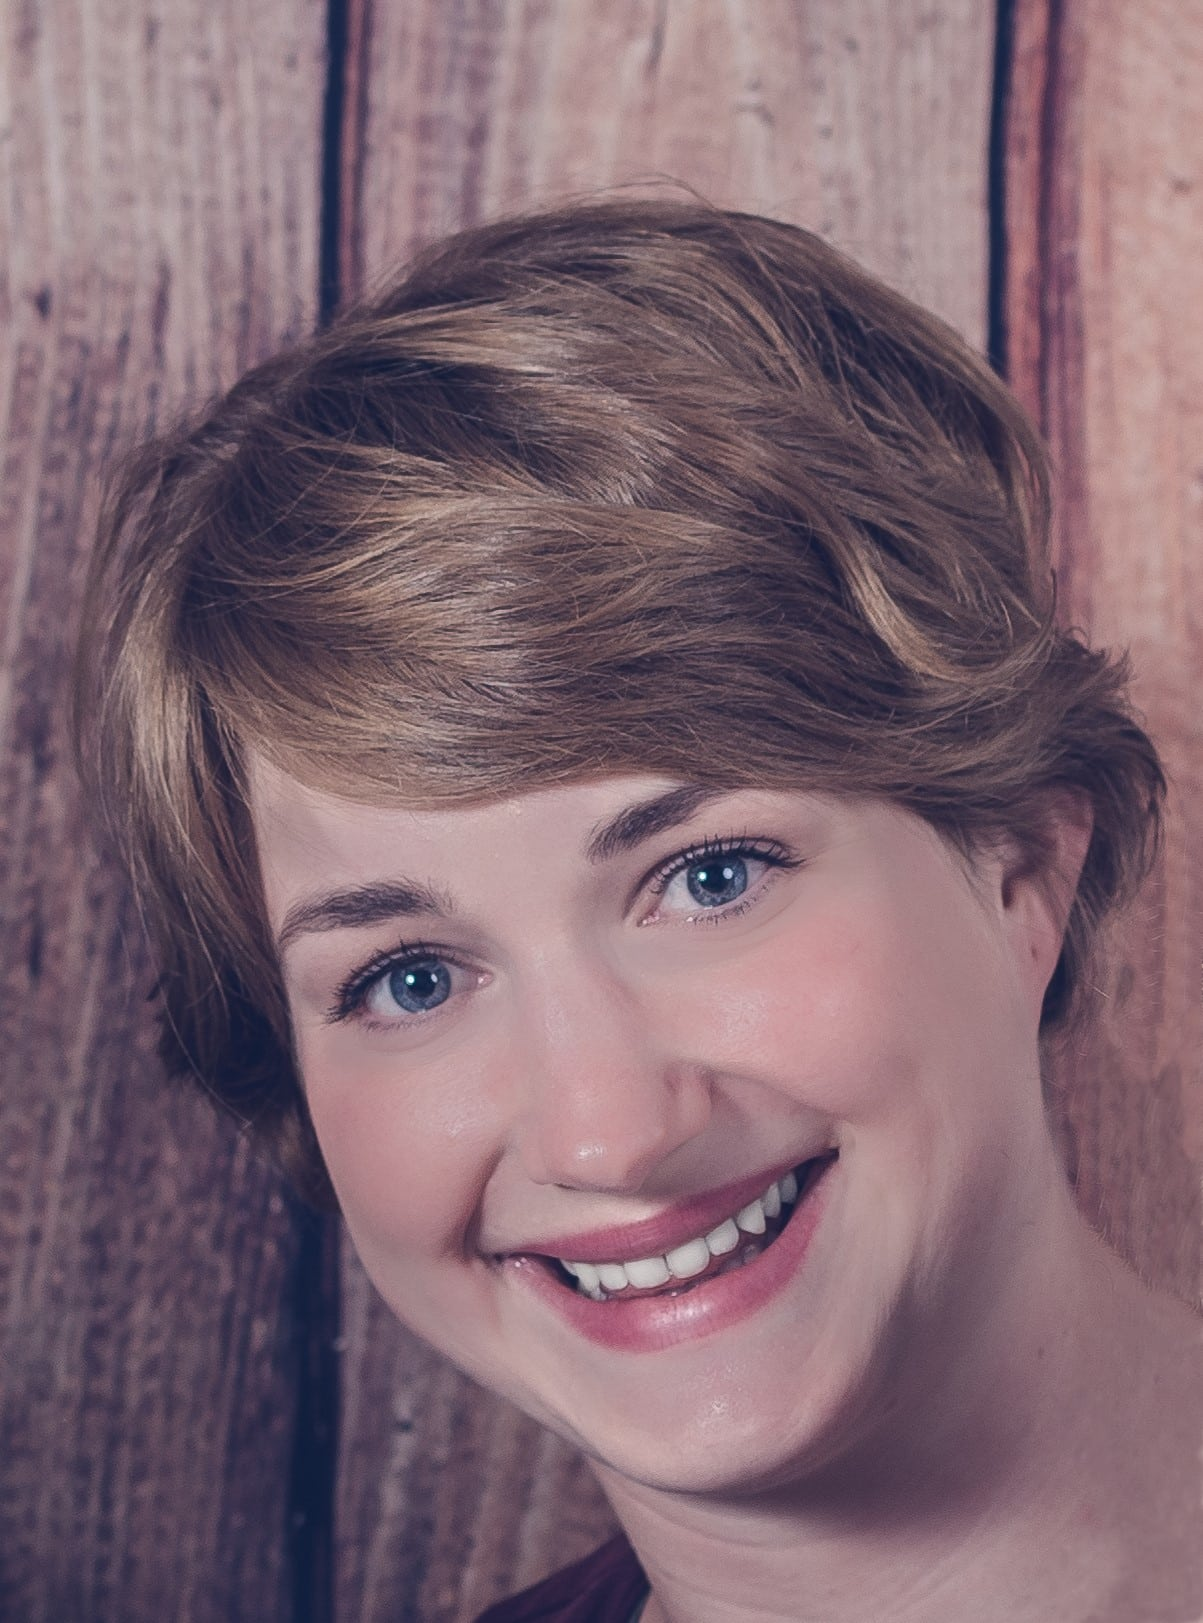 Doris Wagner - Floristin und Biobäuerin